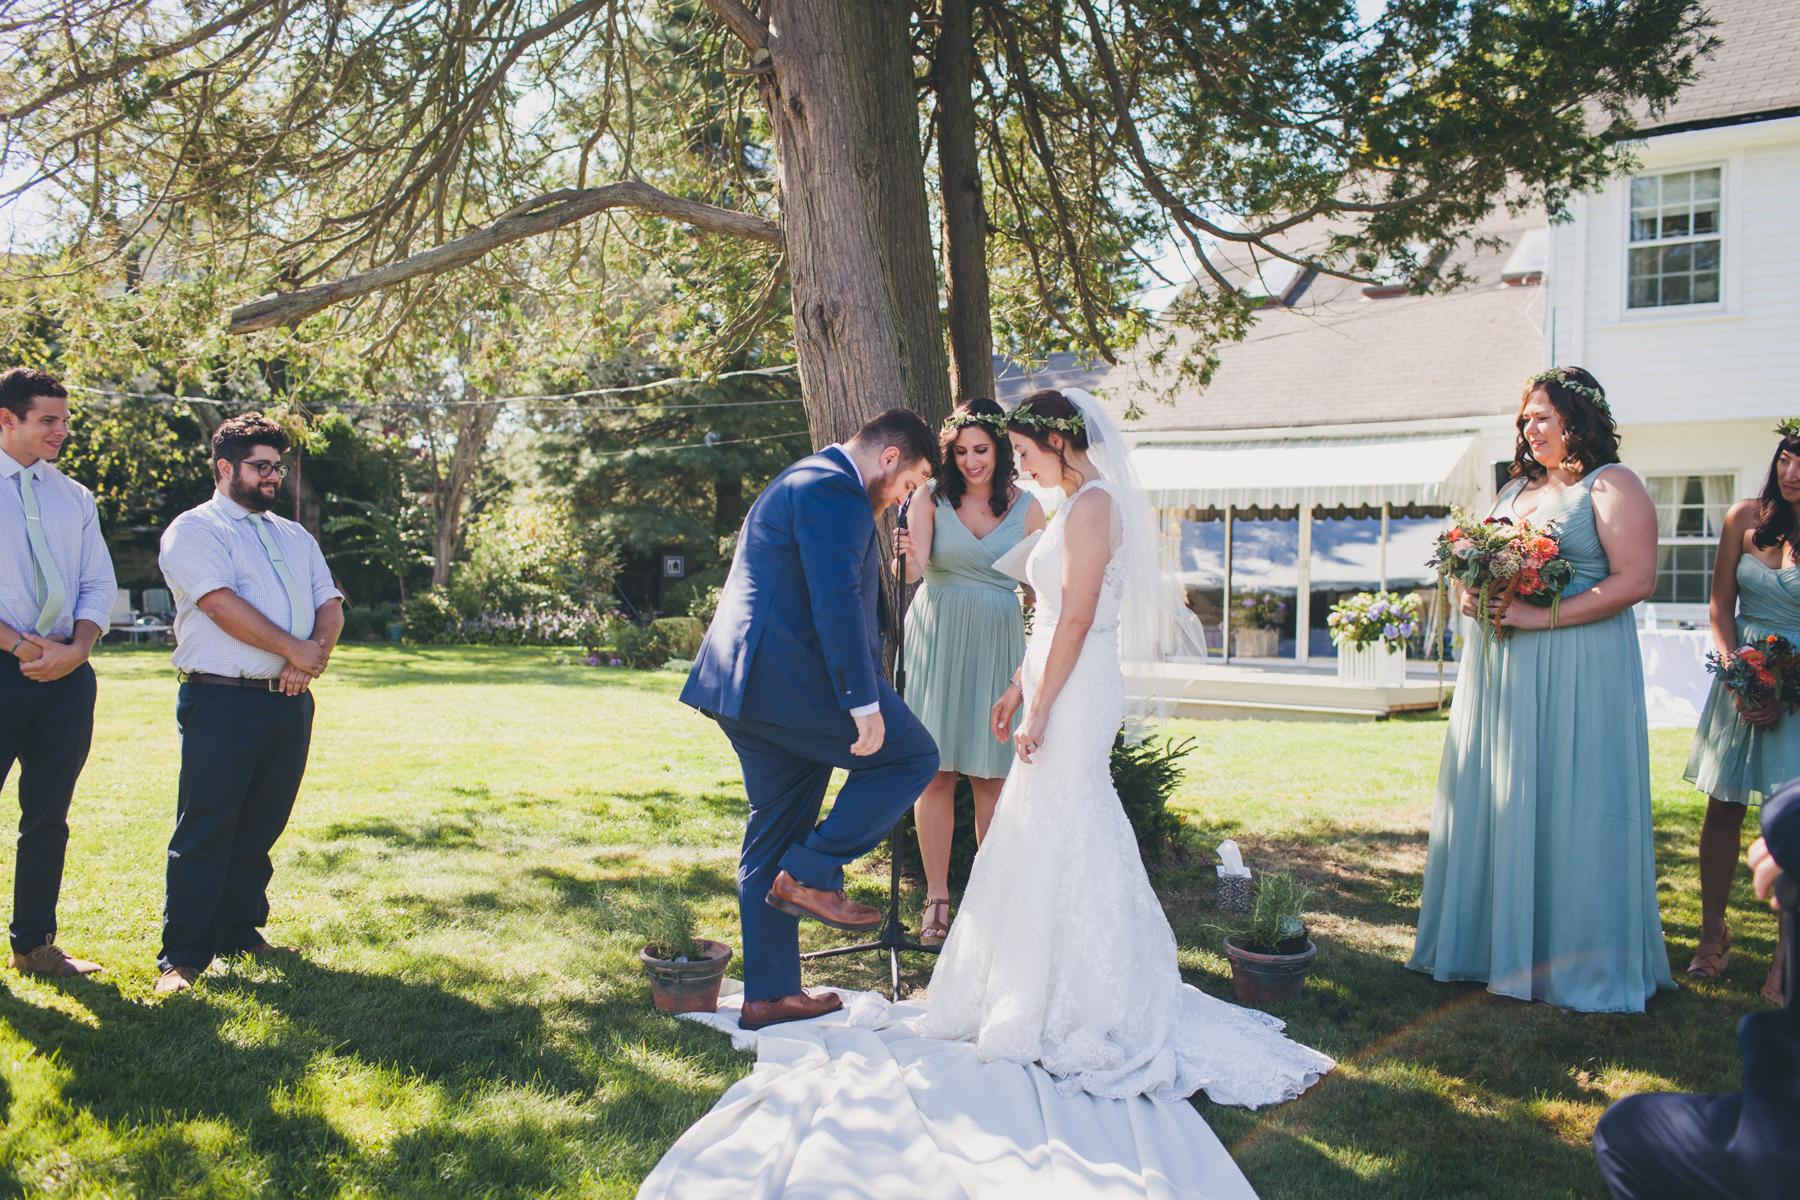 Long-Island-Documentary-Wedding-Photography-Summer-Tent-Wedding-in-New-York-72.jpg